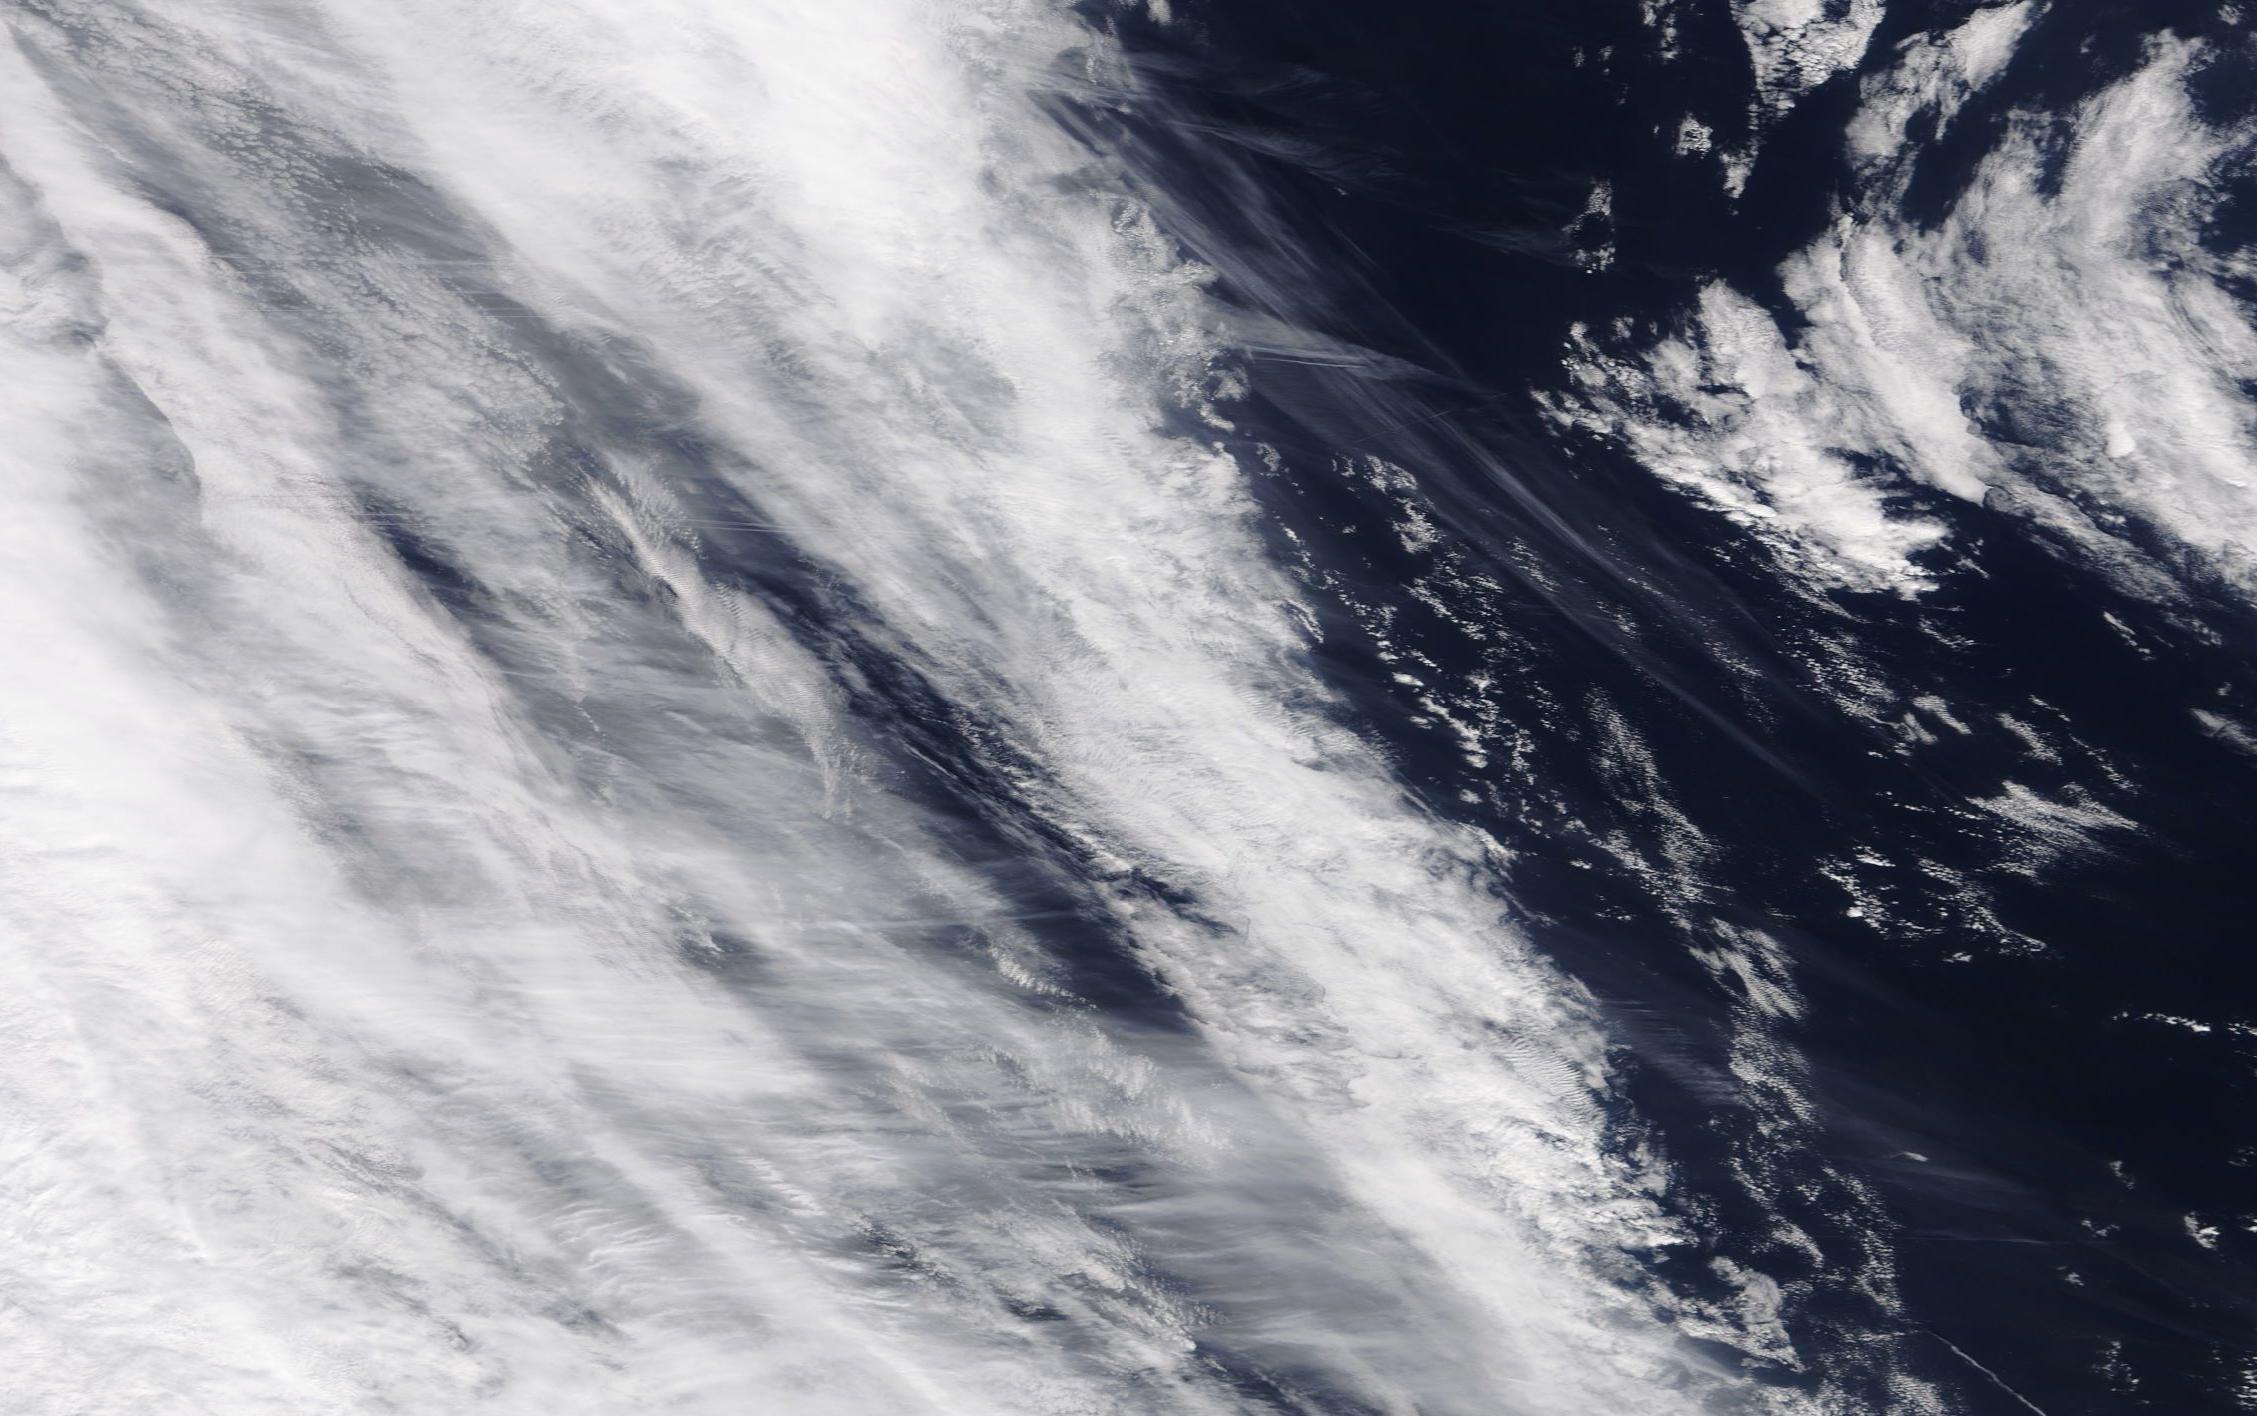 chemtrails and geoengineering ... north Atlantic 6 April 2019 https://go.nasa.gov/2UzkzI6